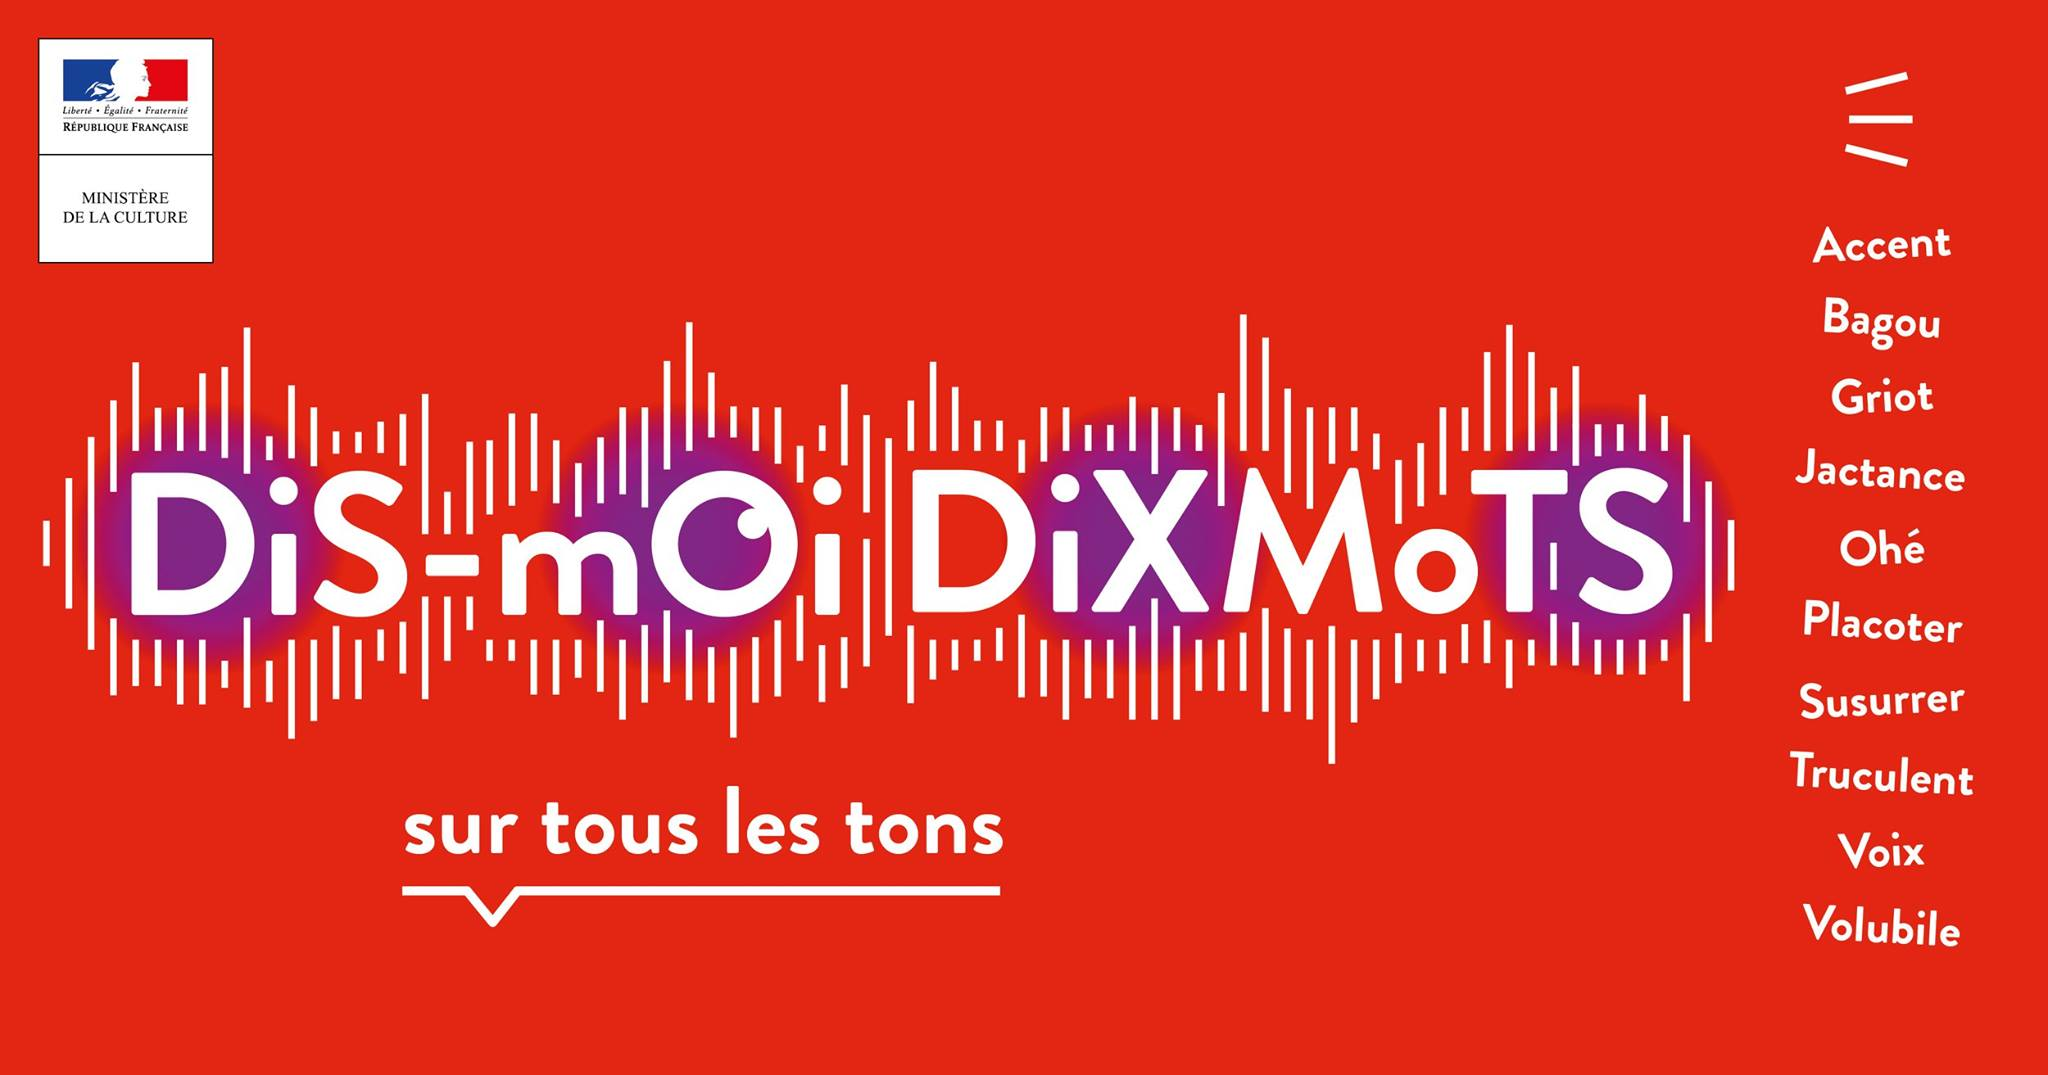 Image result for dis moi dix mots 2018 mots